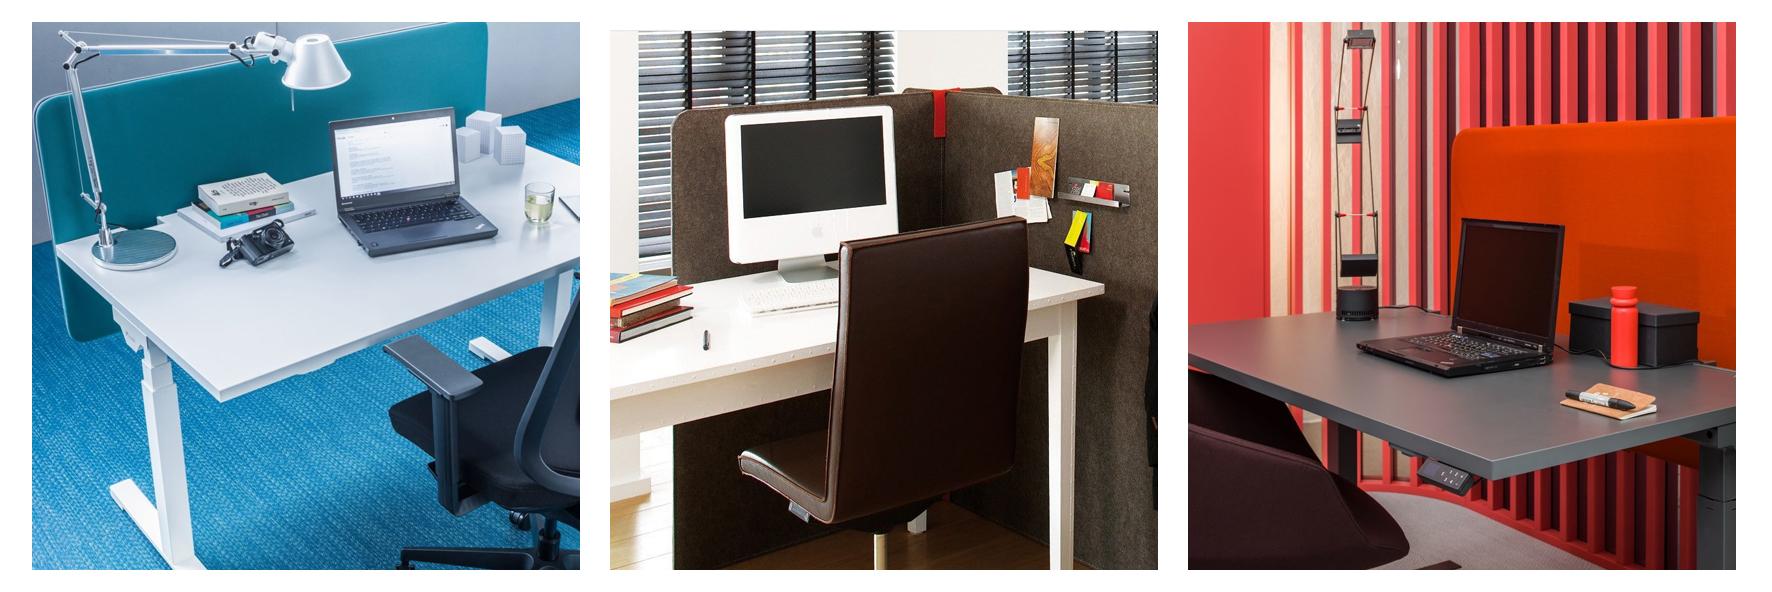 inspiration du jour : aménager un bureau design, tendance et féminin !